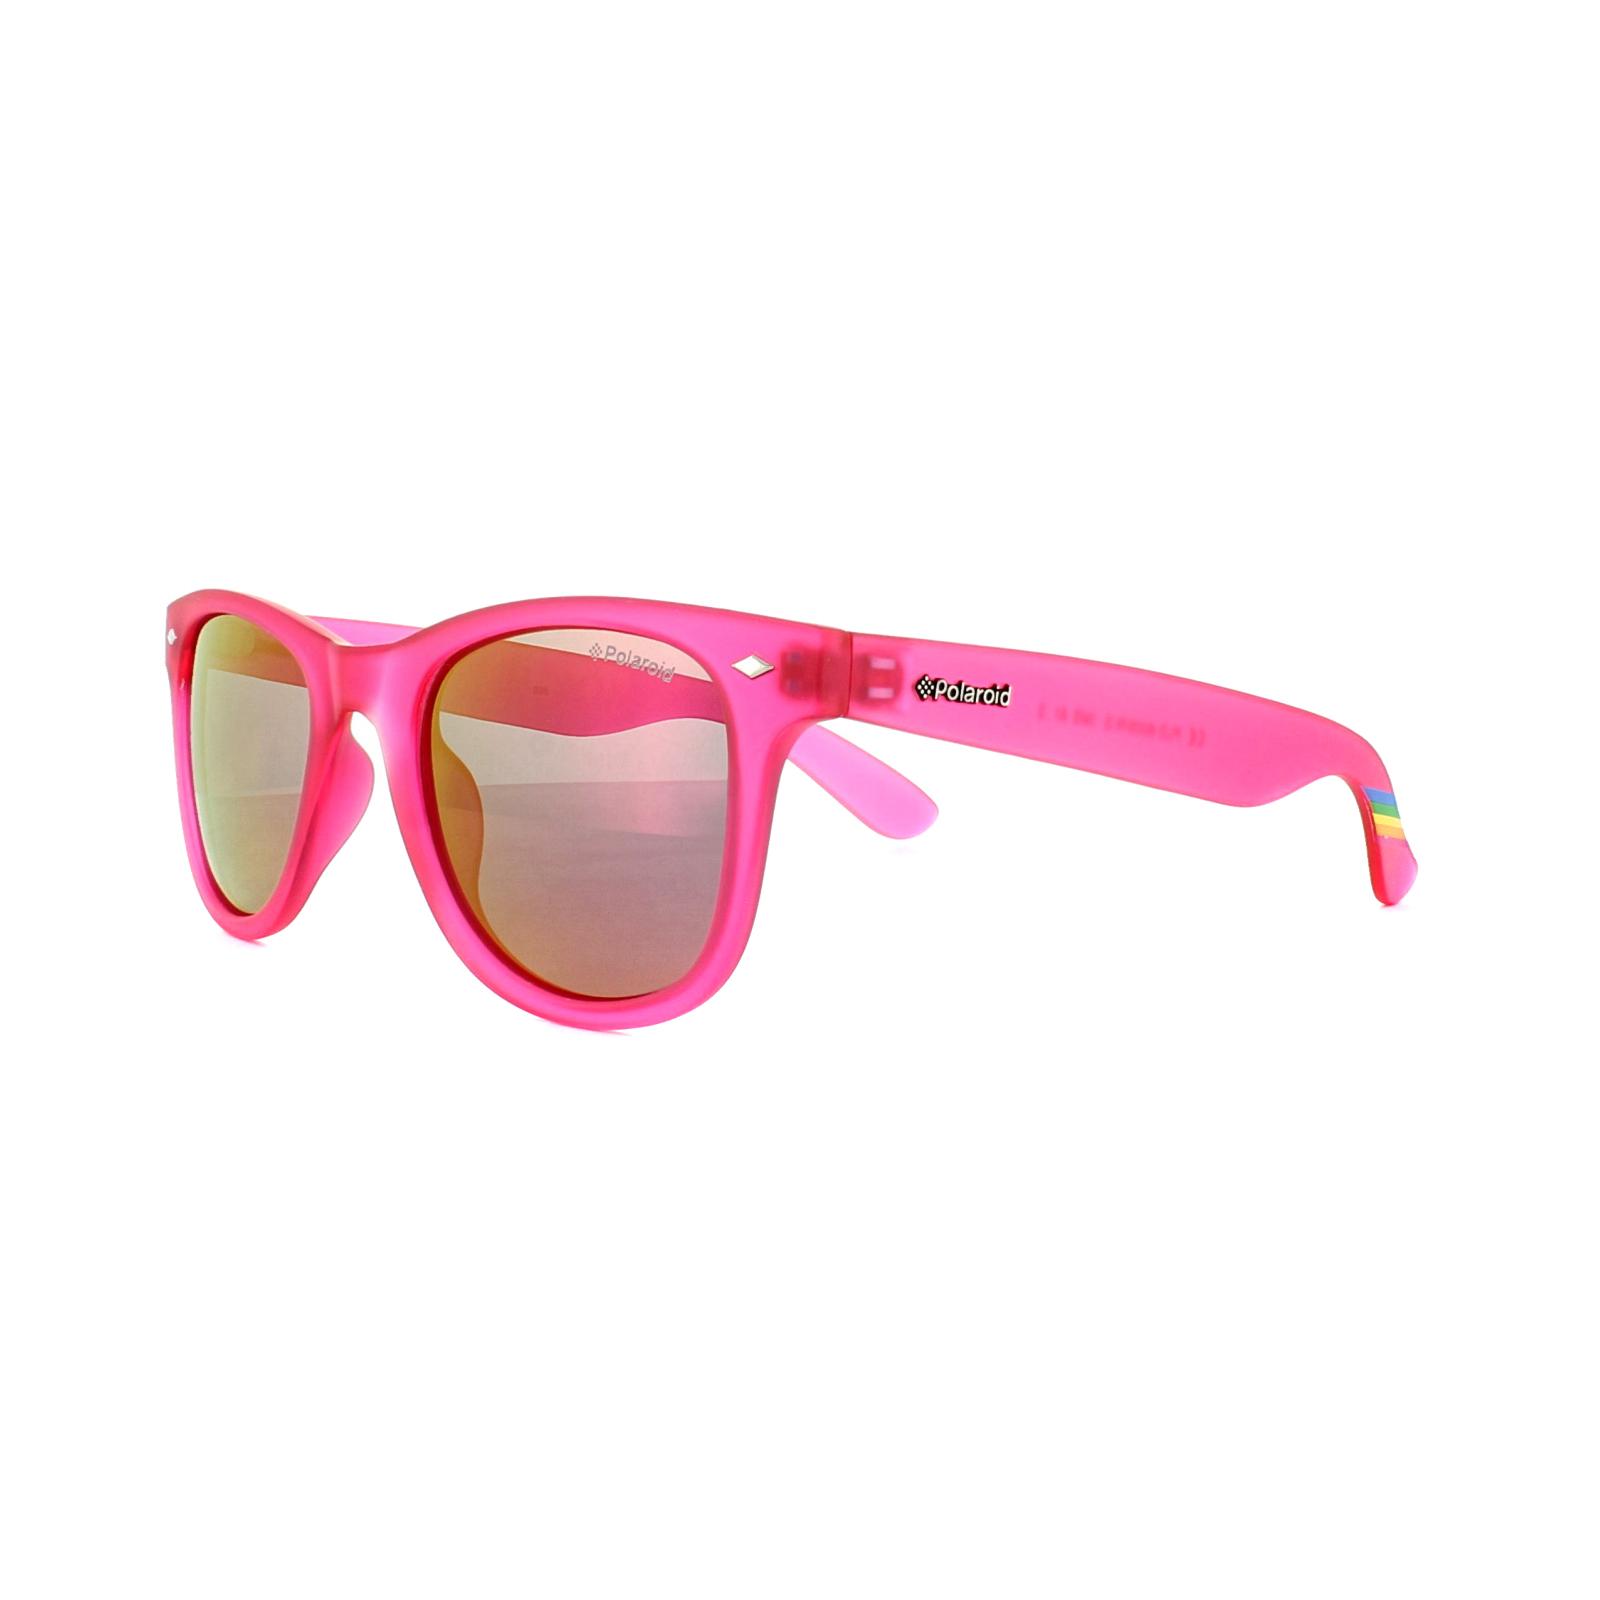 e2f257ab176b Sentinel Polaroid Sunglasses 6009 N S IMS AI Bright Pink Pink Mirror  Polarized